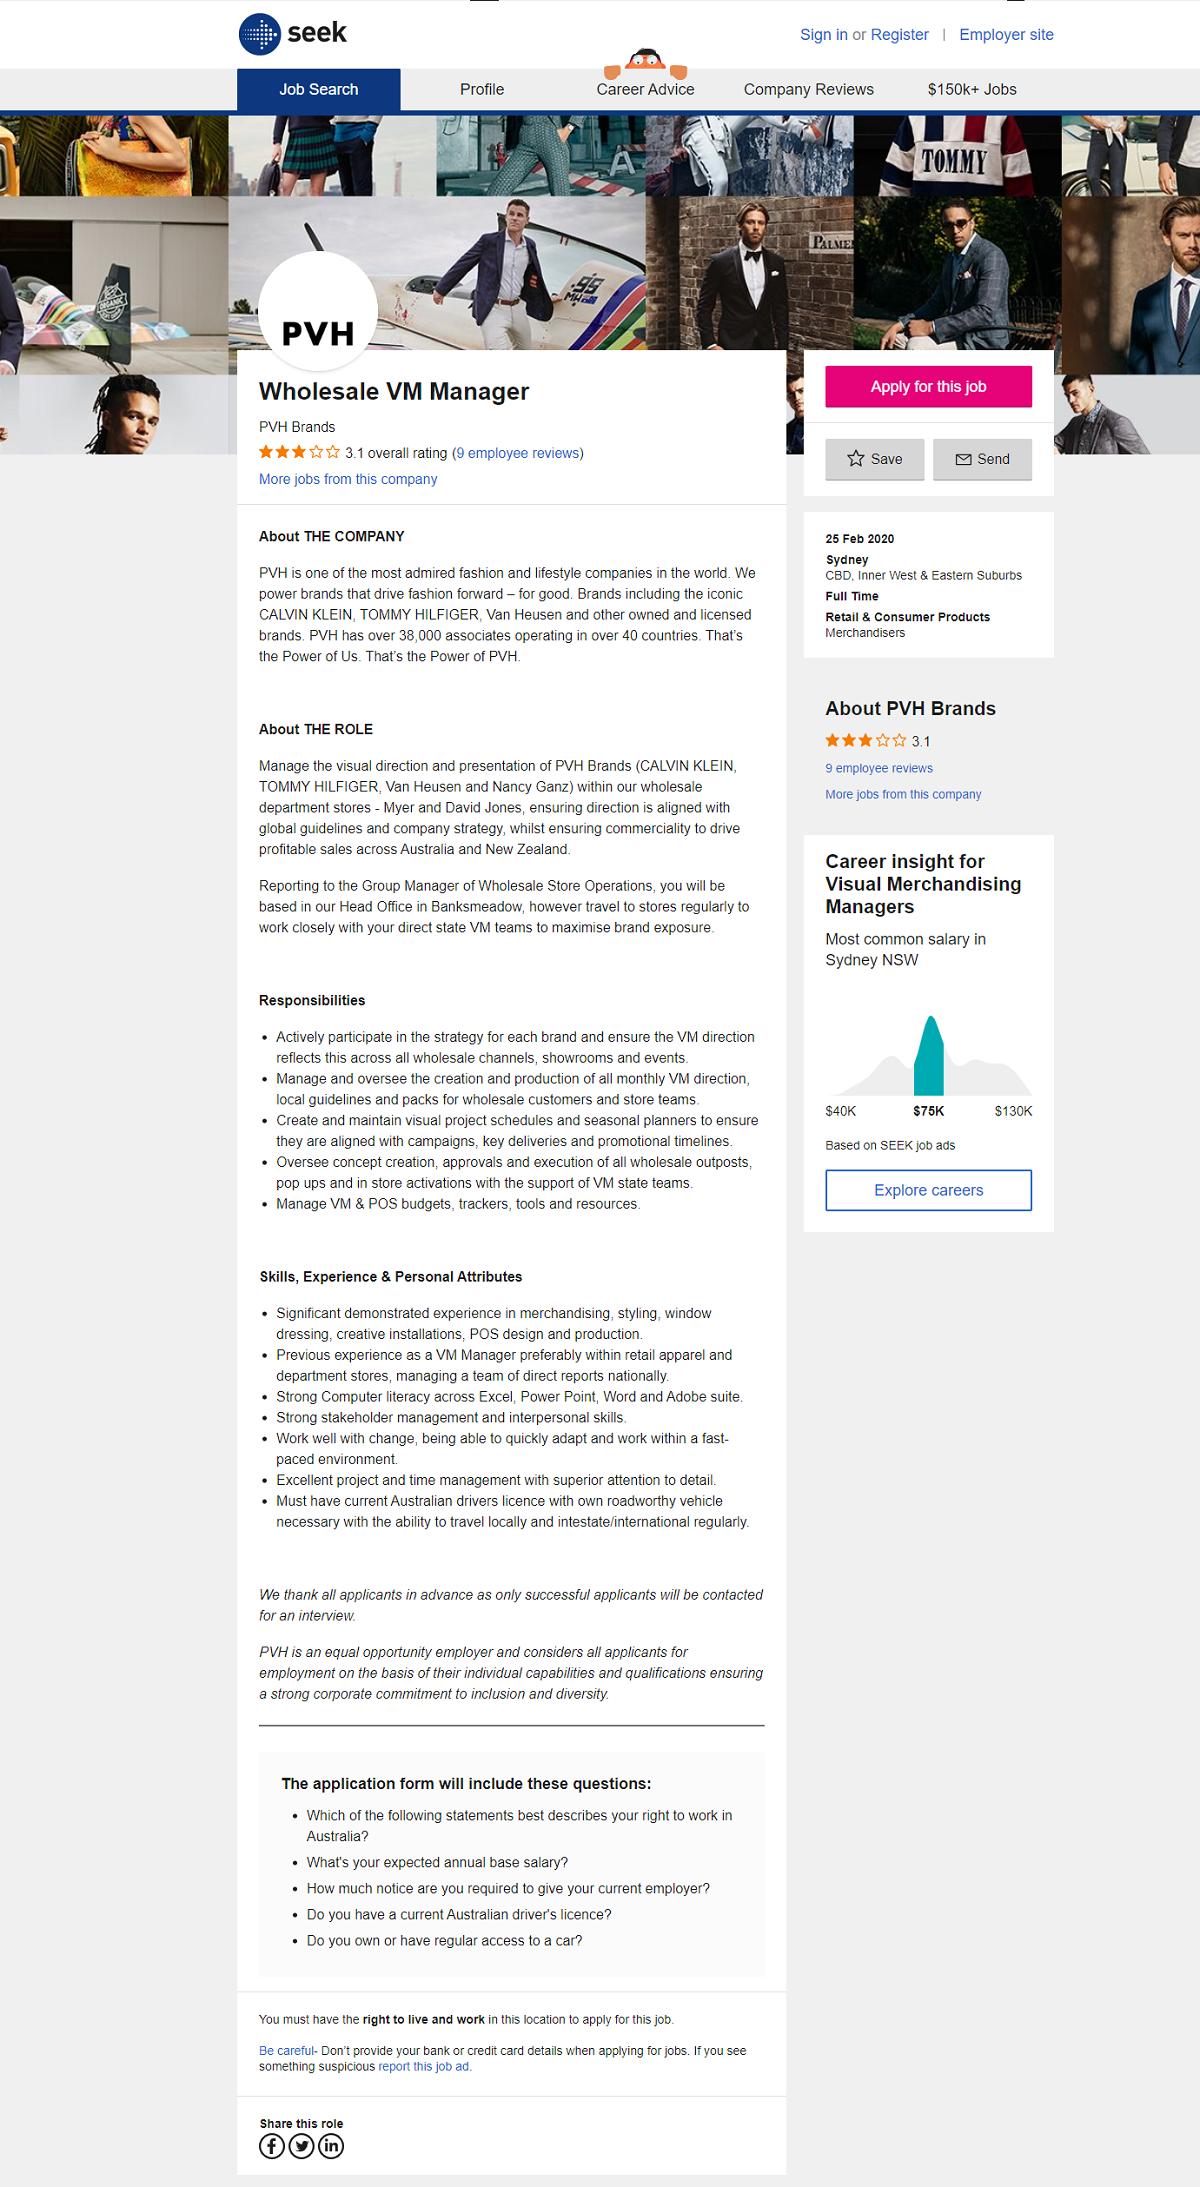 Seek job posting site